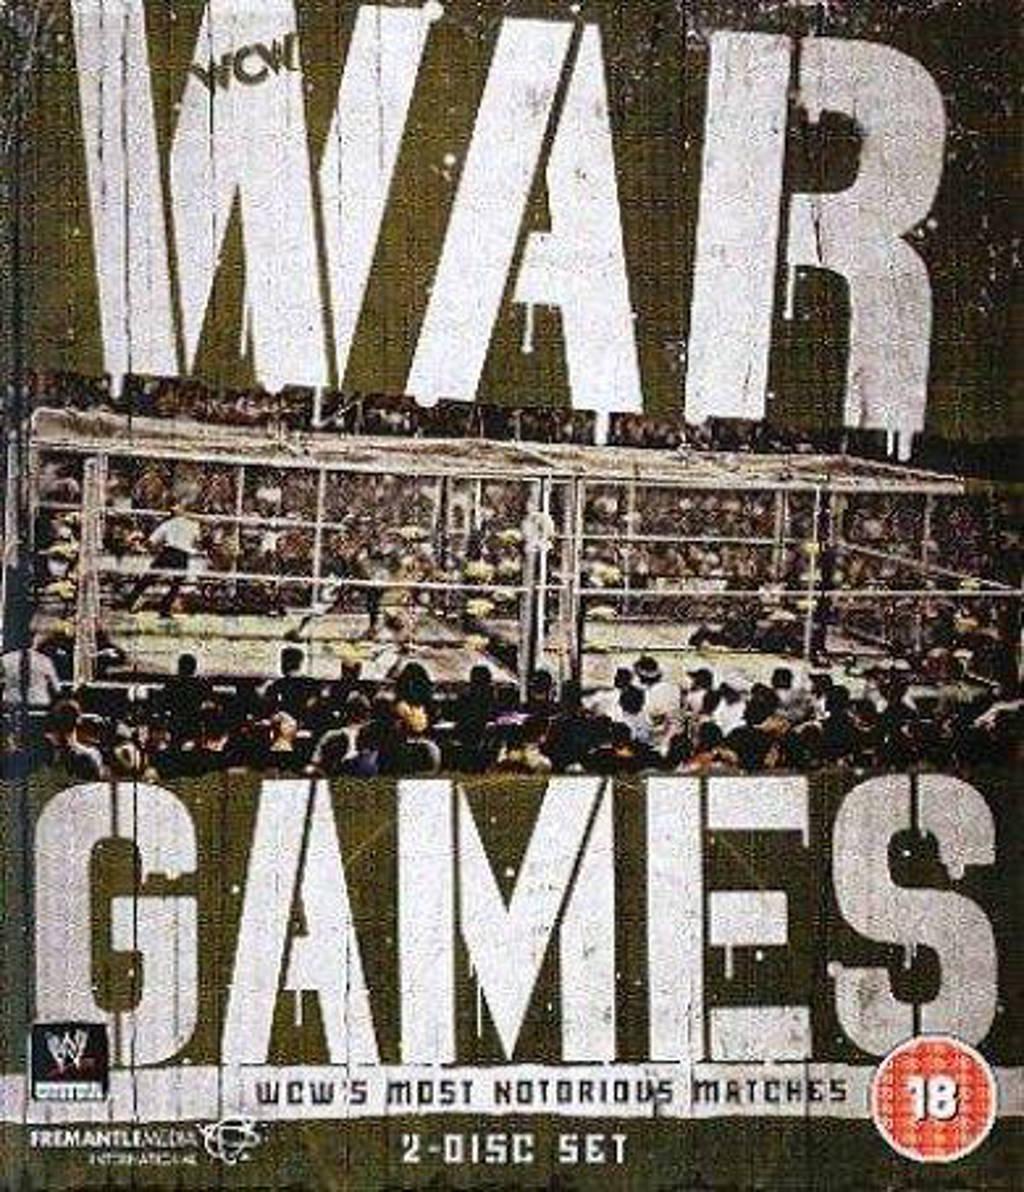 WWE - War Games Wcws Most Notorious Match (Blu-ray)